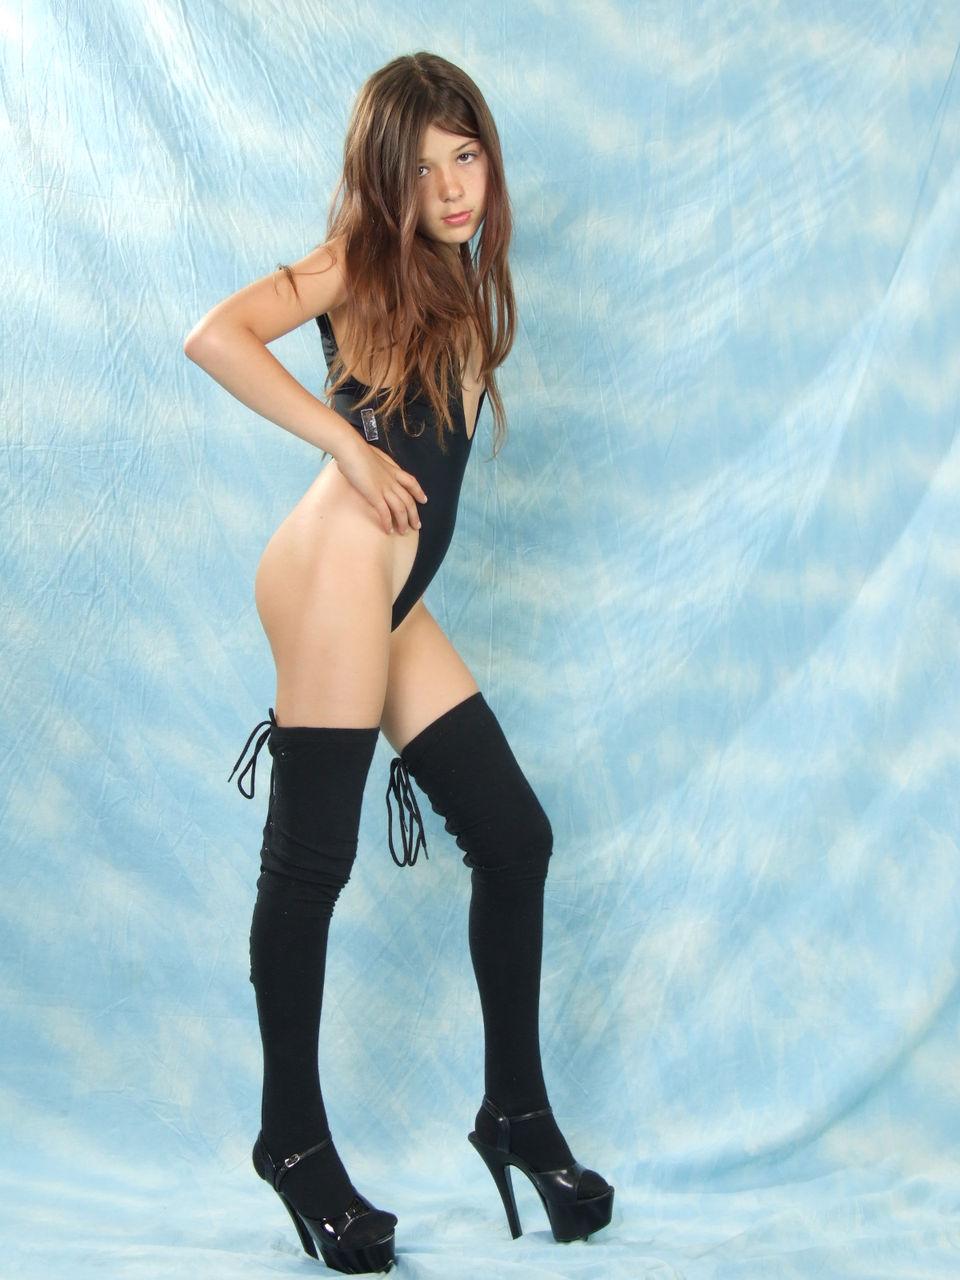 Stocking nude girls-3438